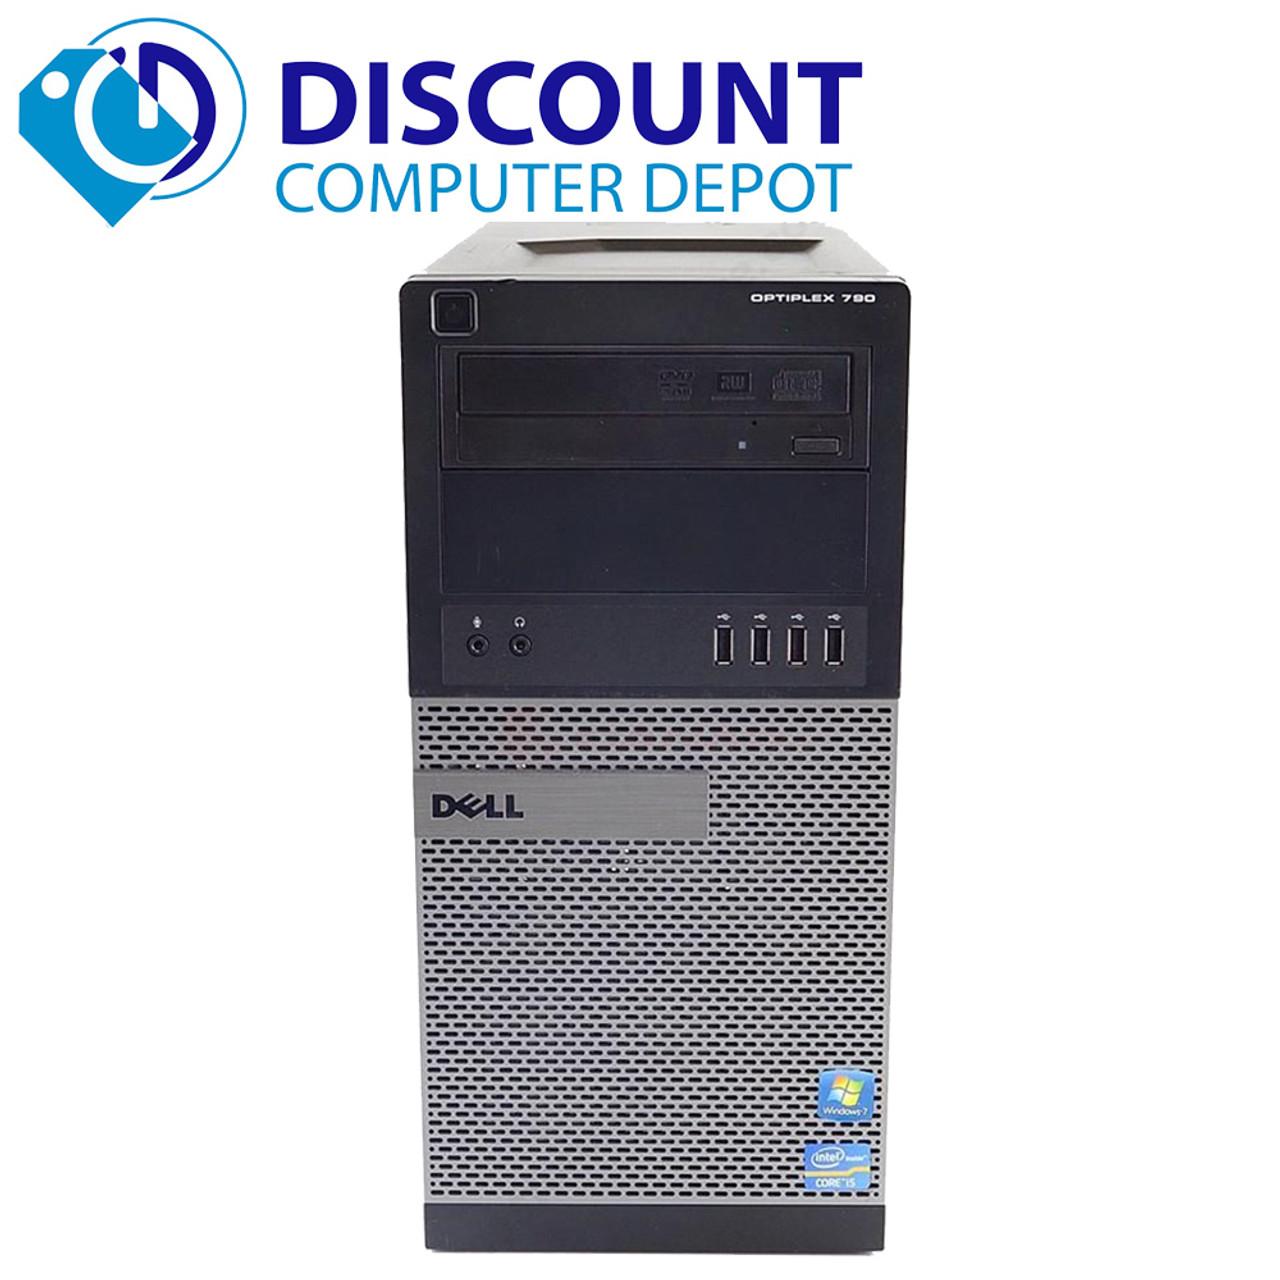 Dell Optiplex 9010 Computer Tower PC Quad Core i7 3 4GHz 8GB 500GB Dual  Video Ready! and WIFI